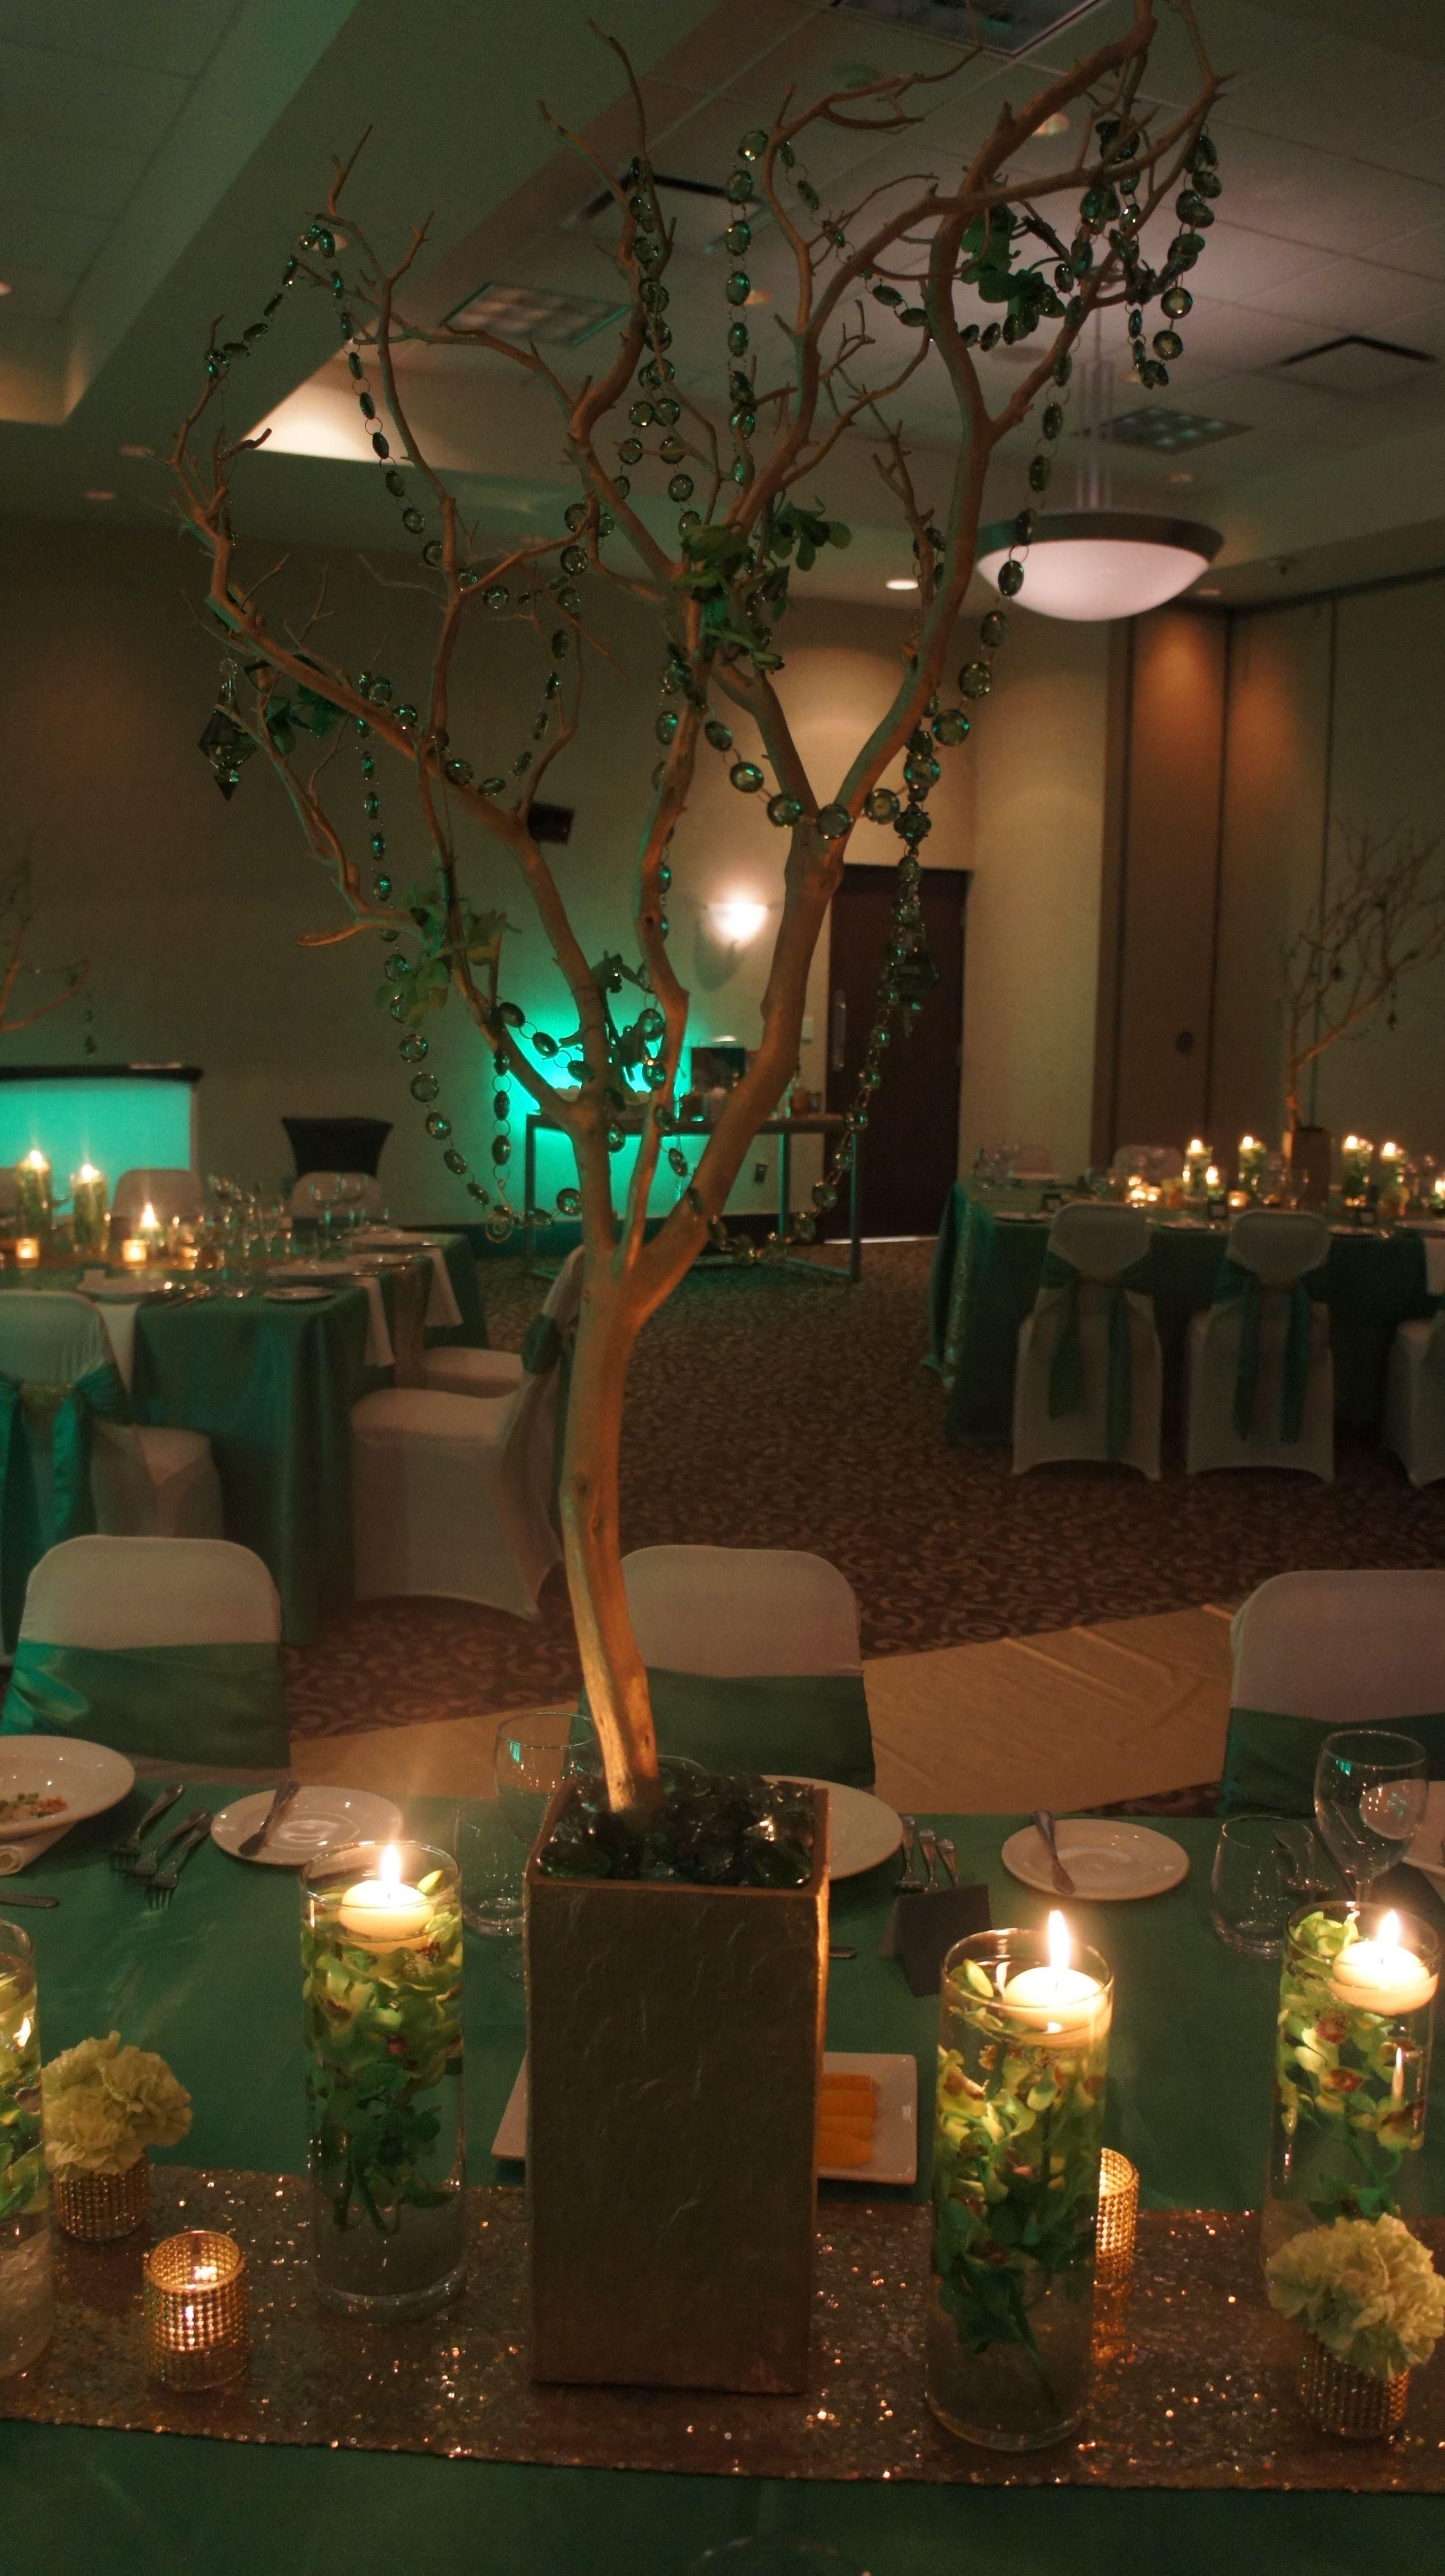 Emerald wedding decor ideas  Waterloo B  Emerald City Themed Event  Party planning  Pinterest